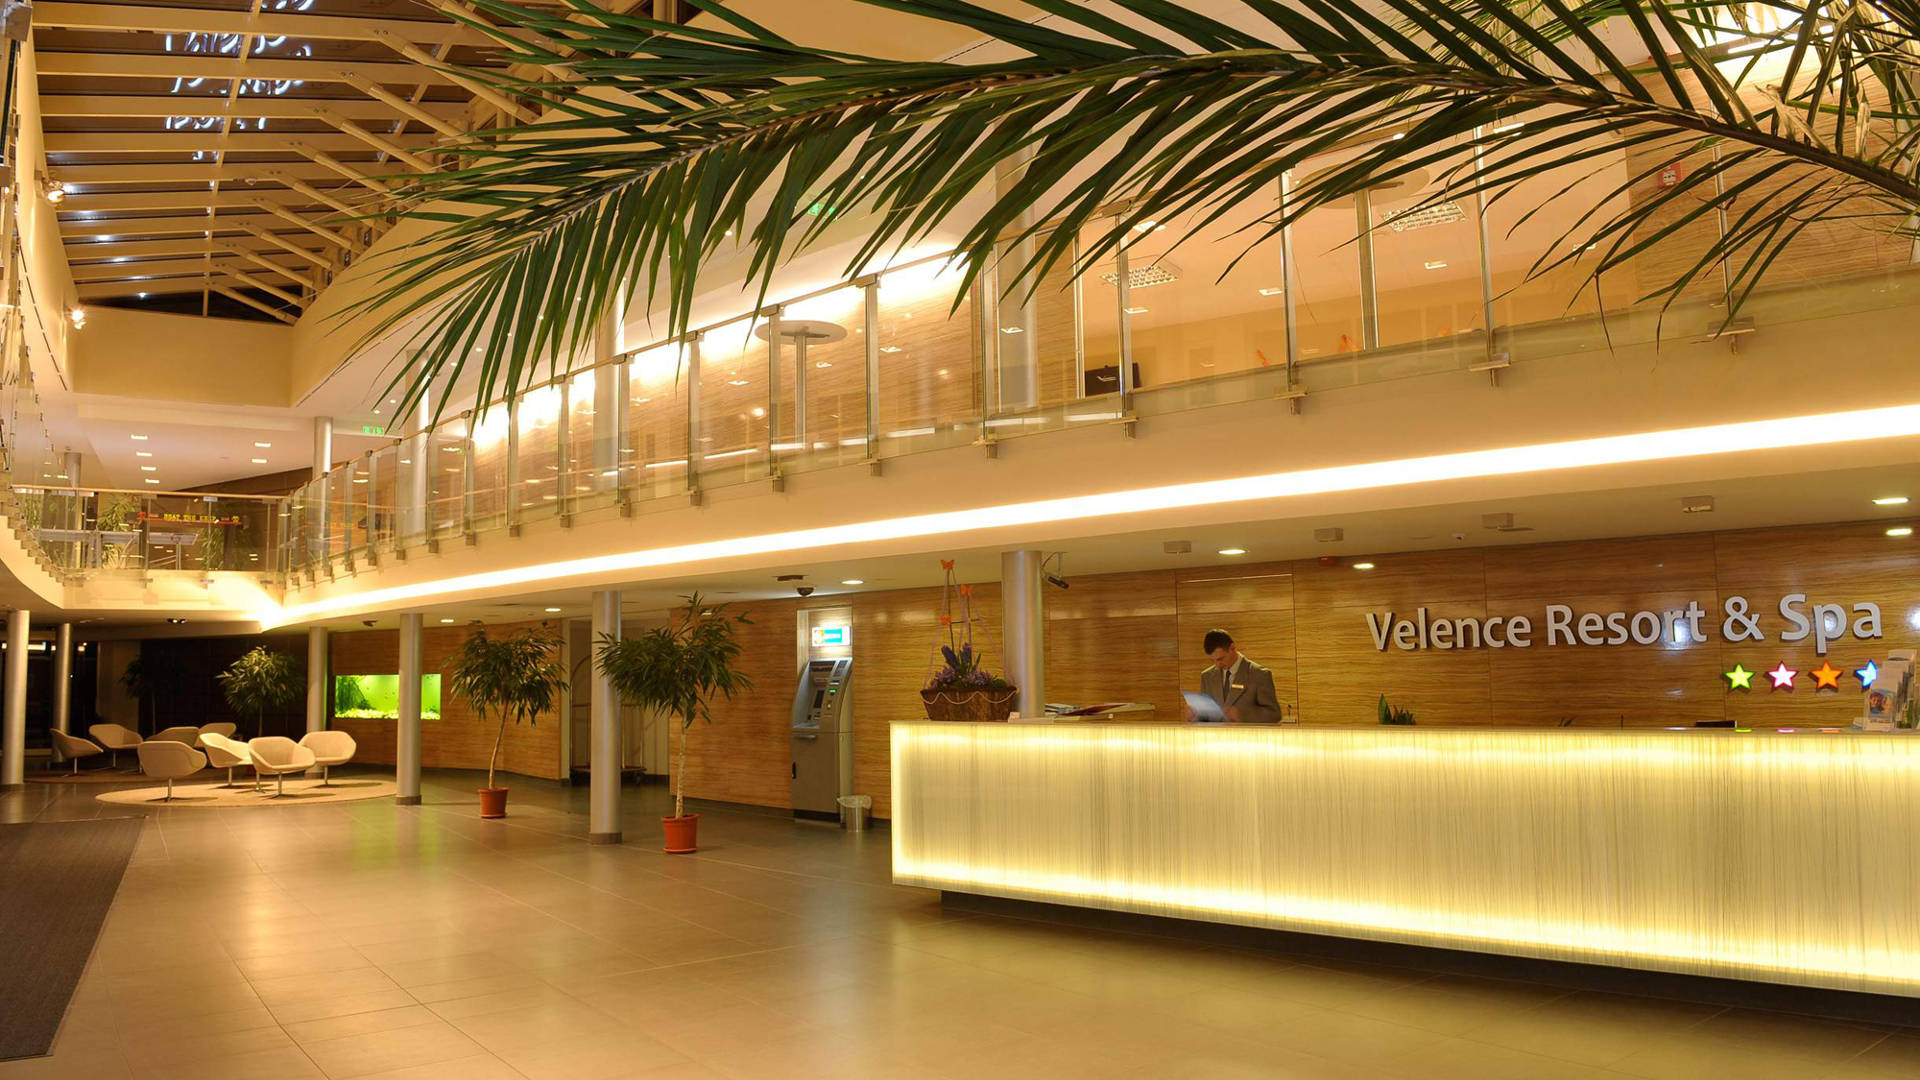 Velence Resort & Spa - A lobby